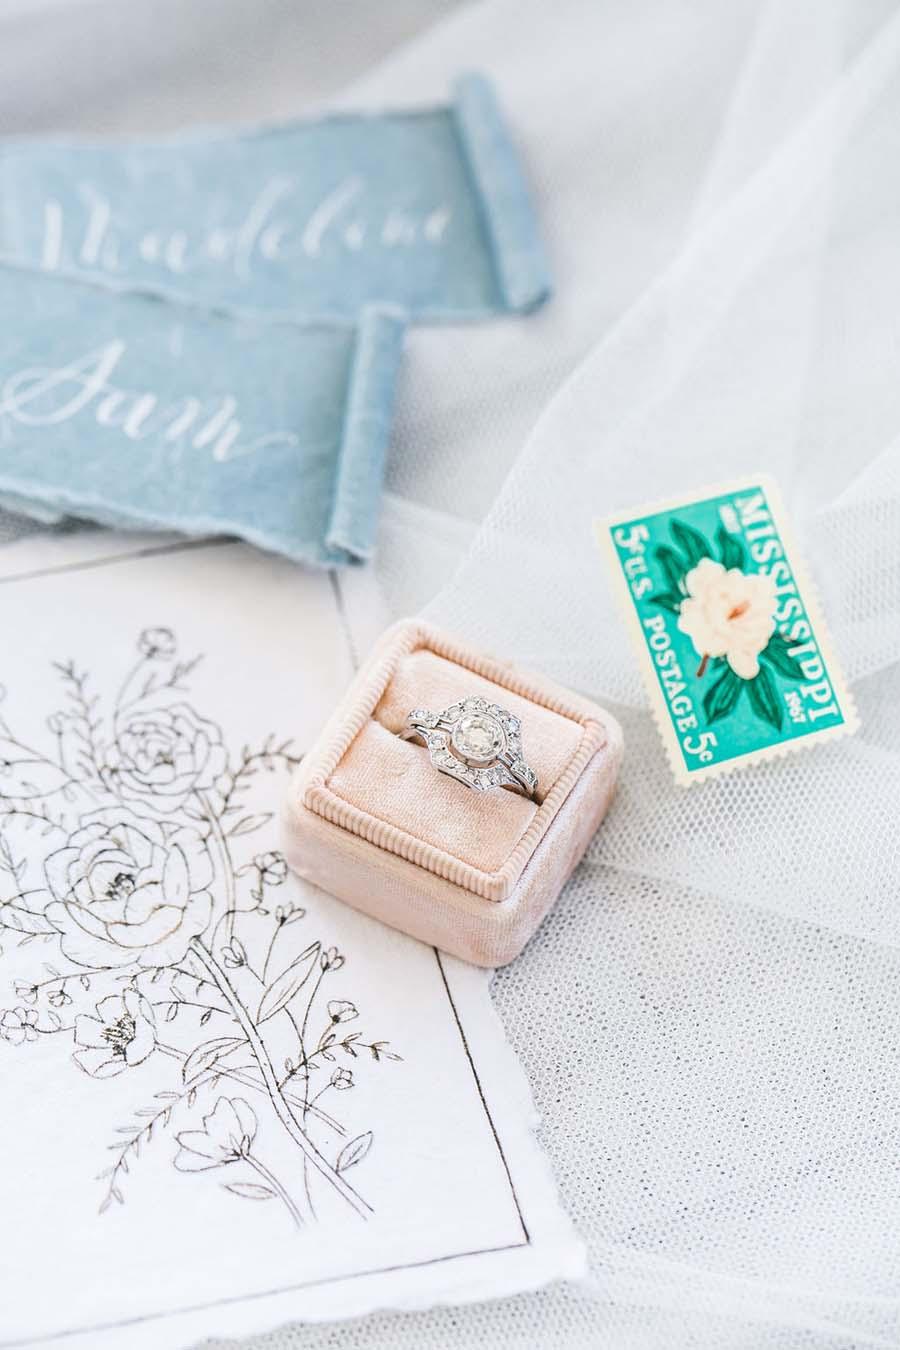 hannahq.com | Hannah Q Photography Denver Colorado and Destination | Portrait and Branding Photographer | Fine Art Photography For Weddings and Lifestyle 0 (9).jpg